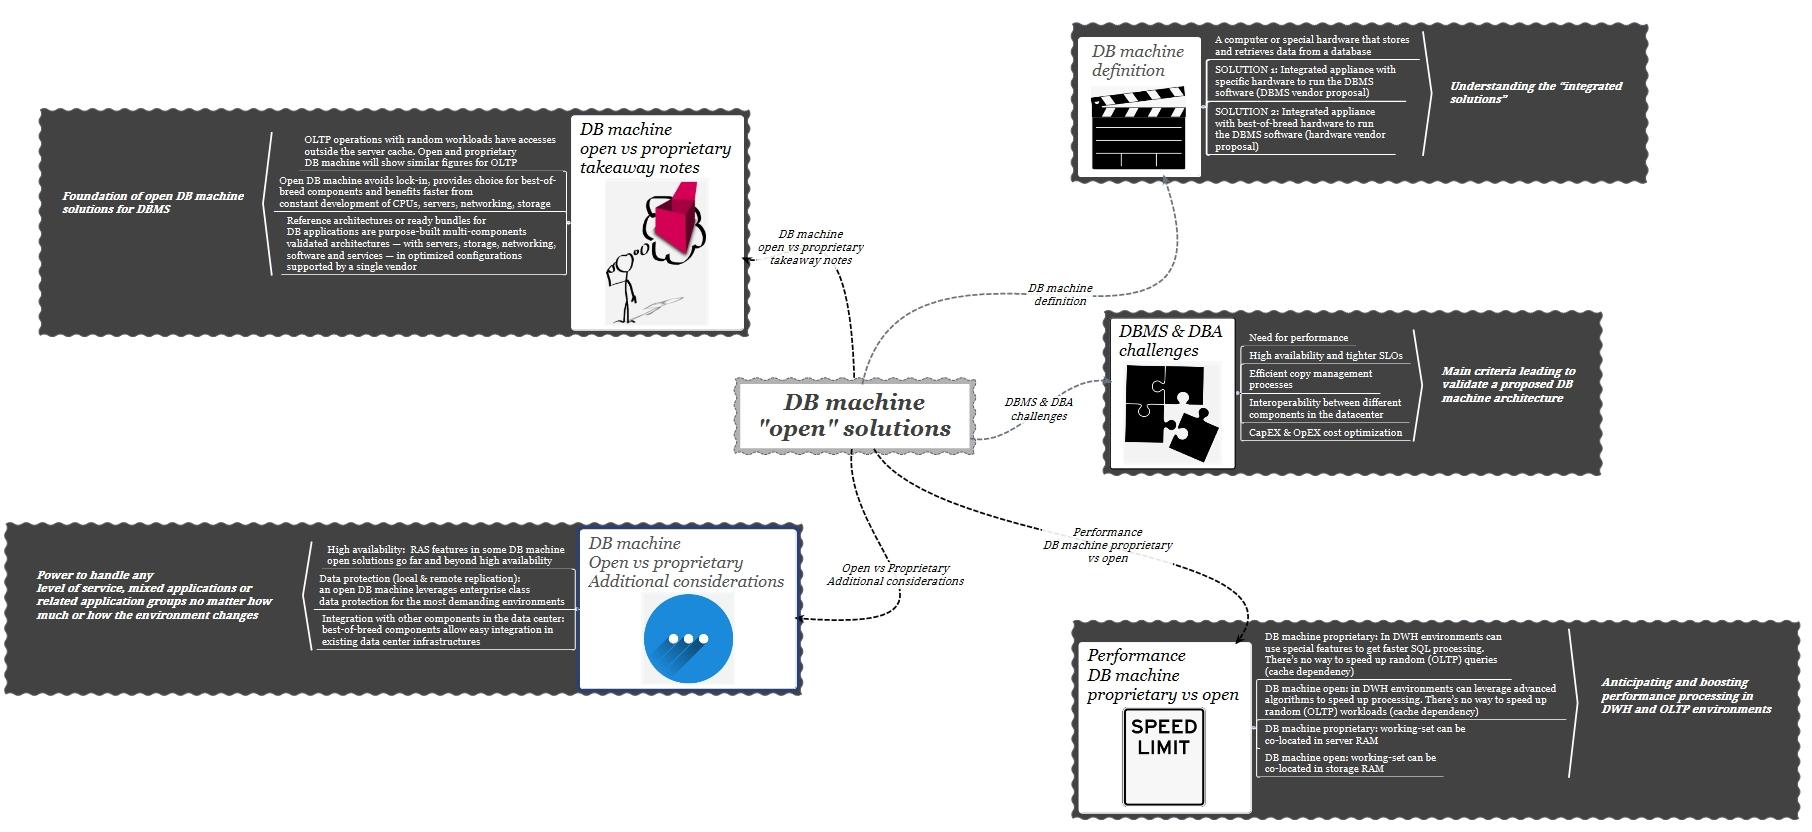 db machine open - big picture